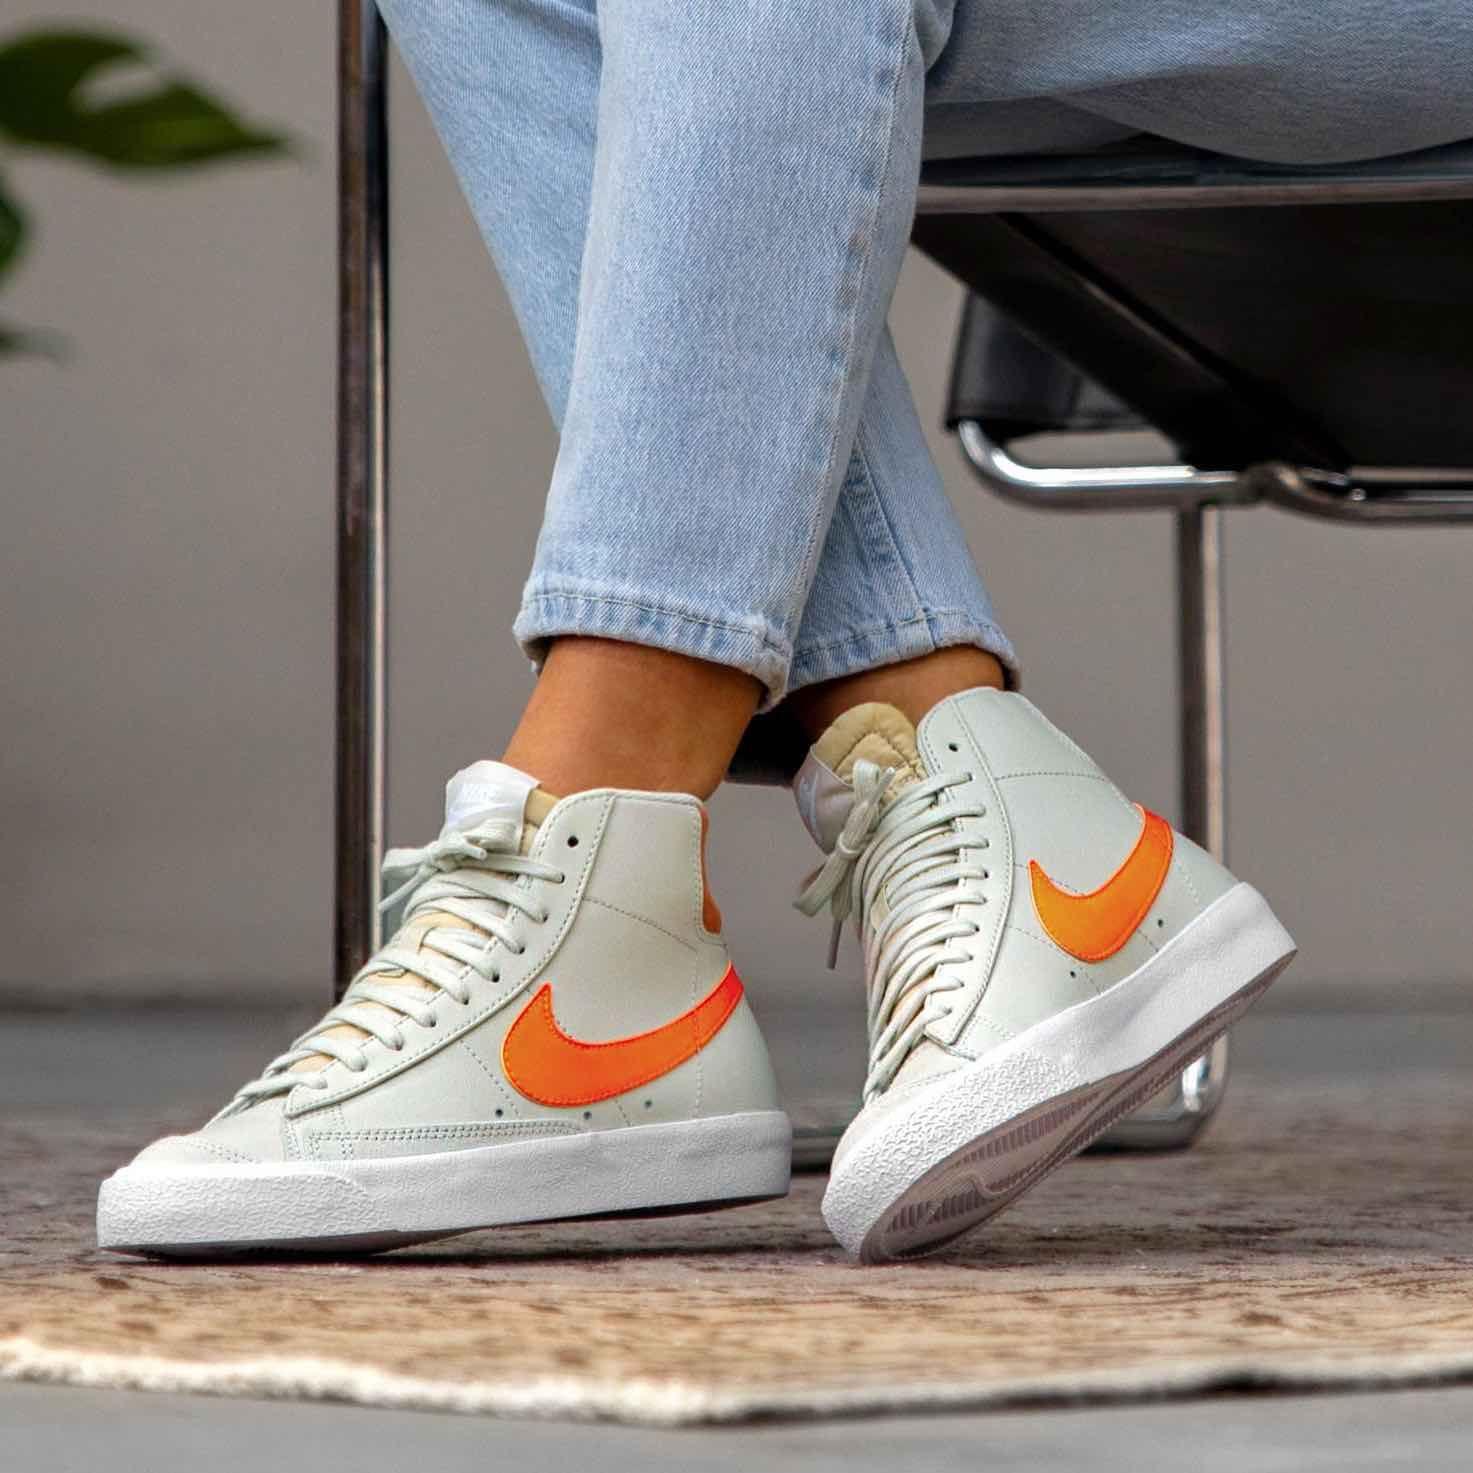 Teoría básica por ciento Dempsey  insidesneakers • NIKE BLAZER MID 77 • CZ0461-001 | Shoes sneakers nike,  Fashion shoes sneakers, Sneakers fashion